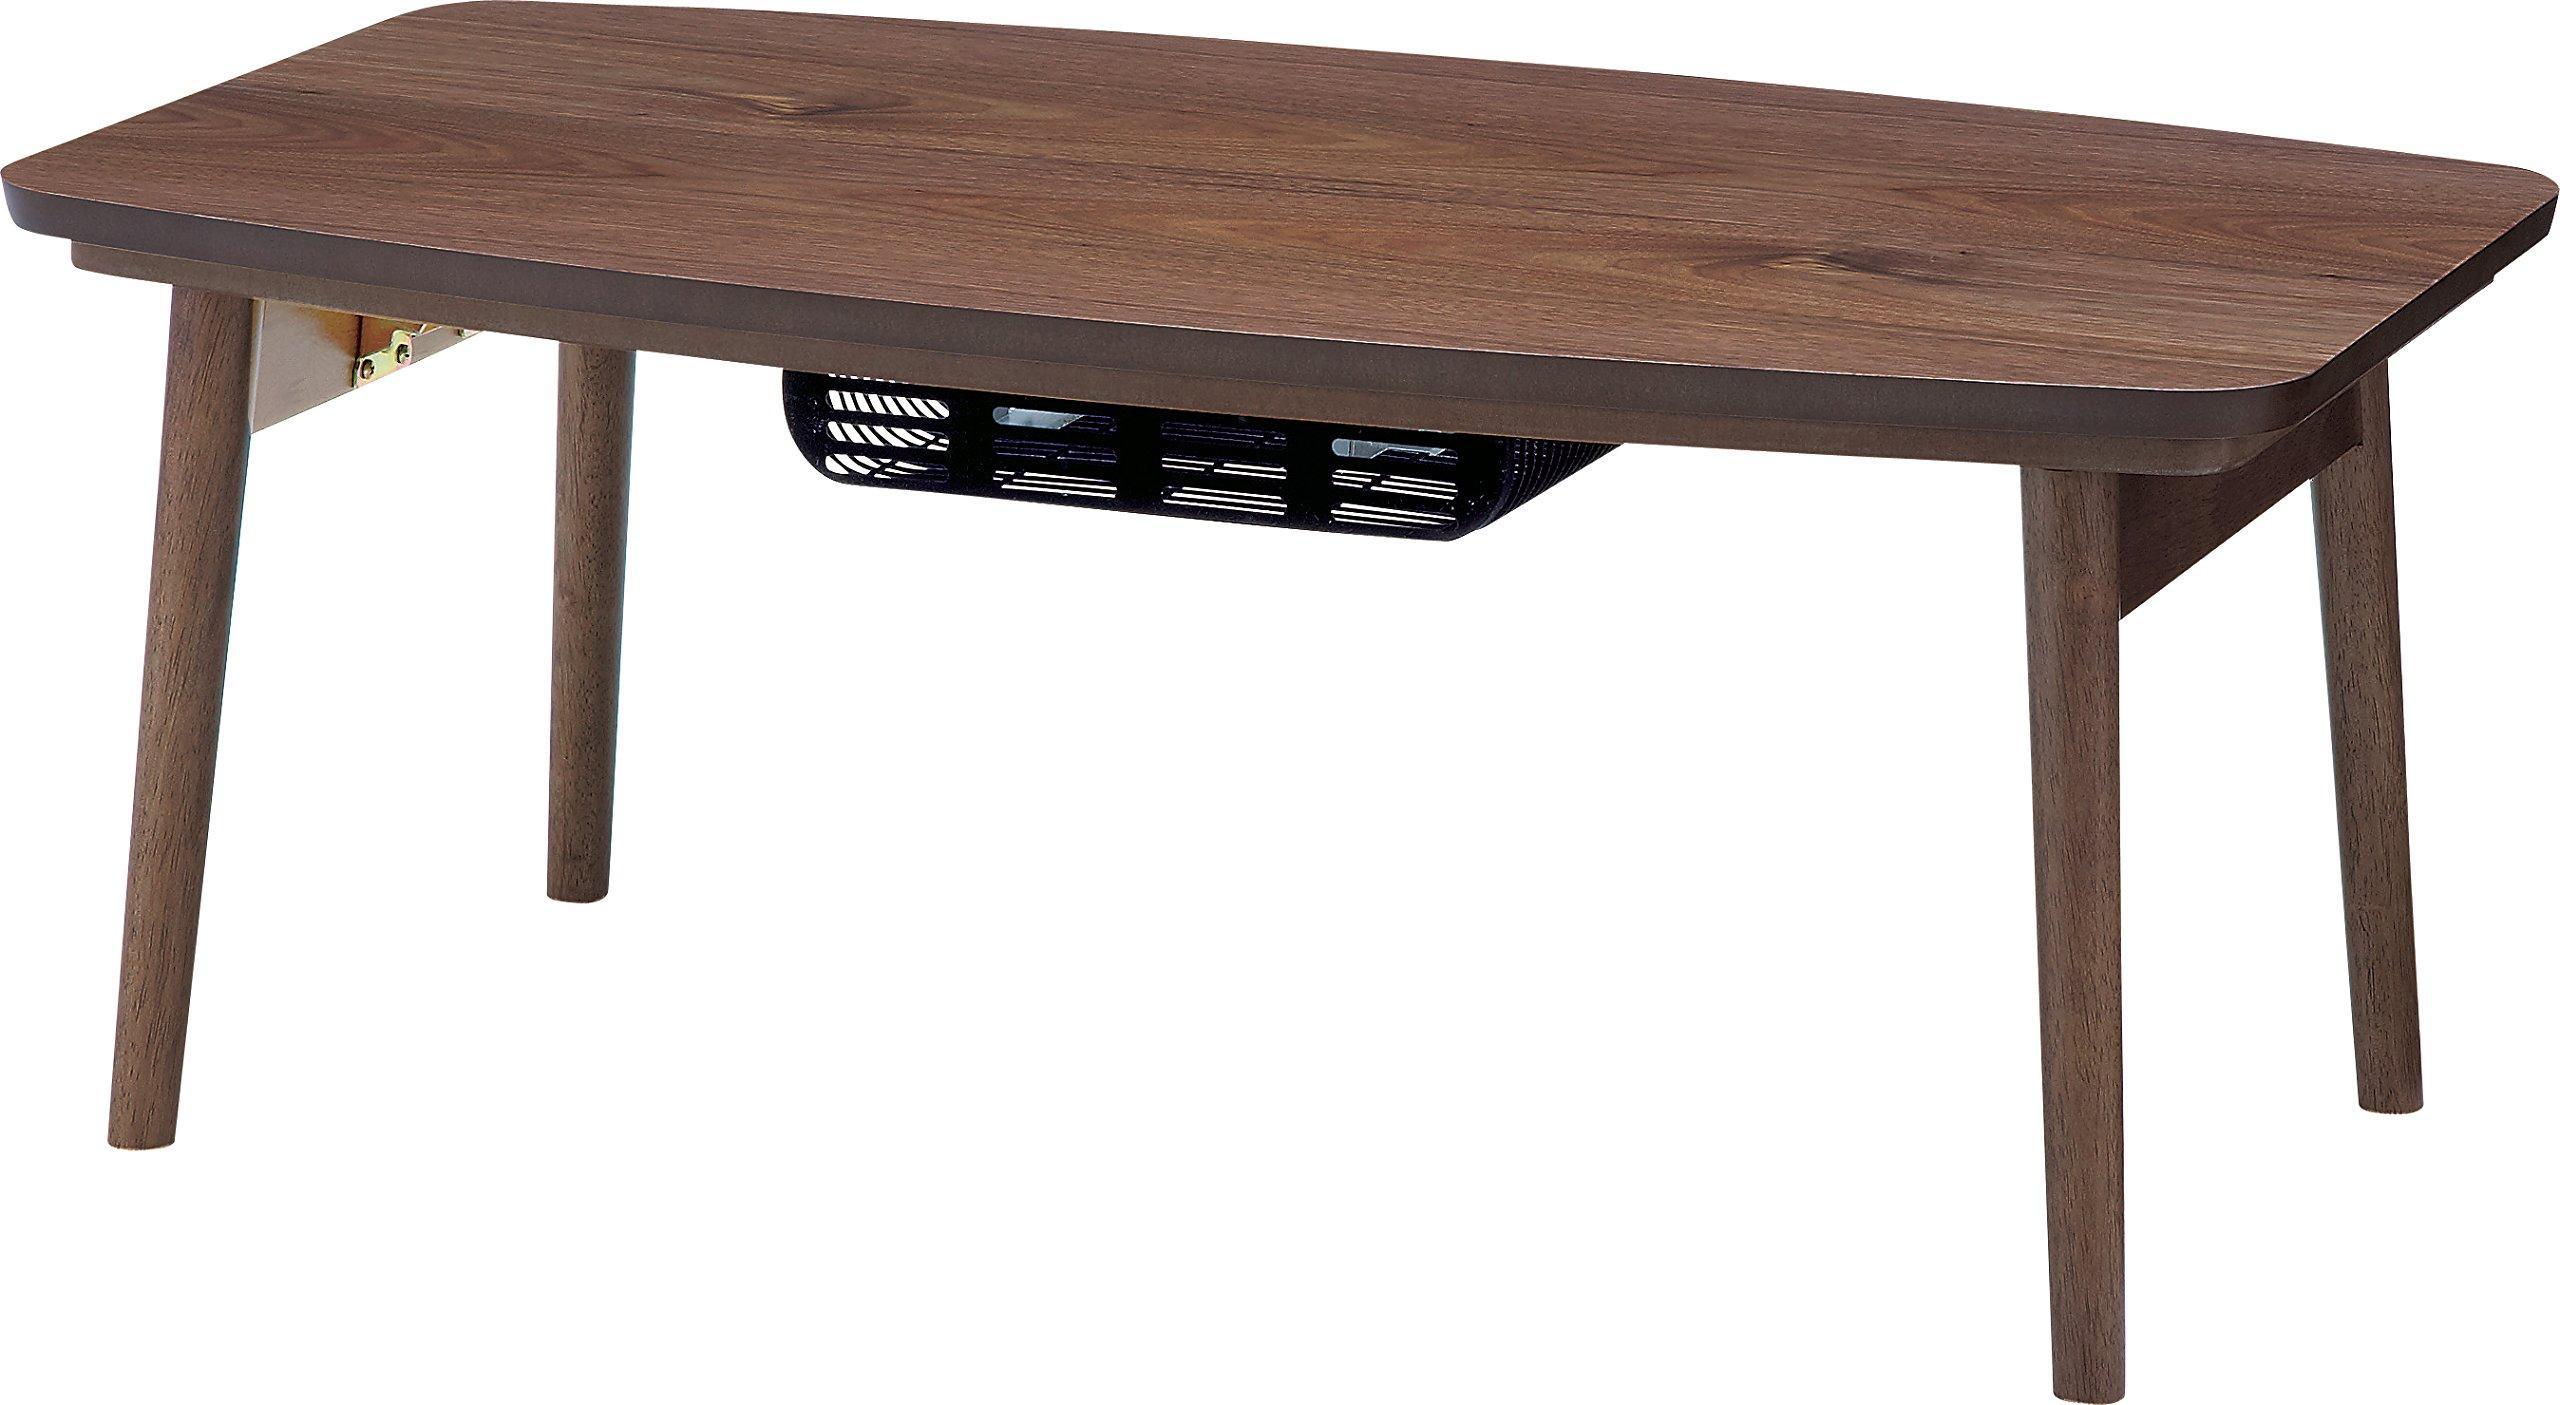 AZUMAYA Folding Legs Wooden Kotatsu Heater Table Walnut Brown ELFE-901WAL Home and Living